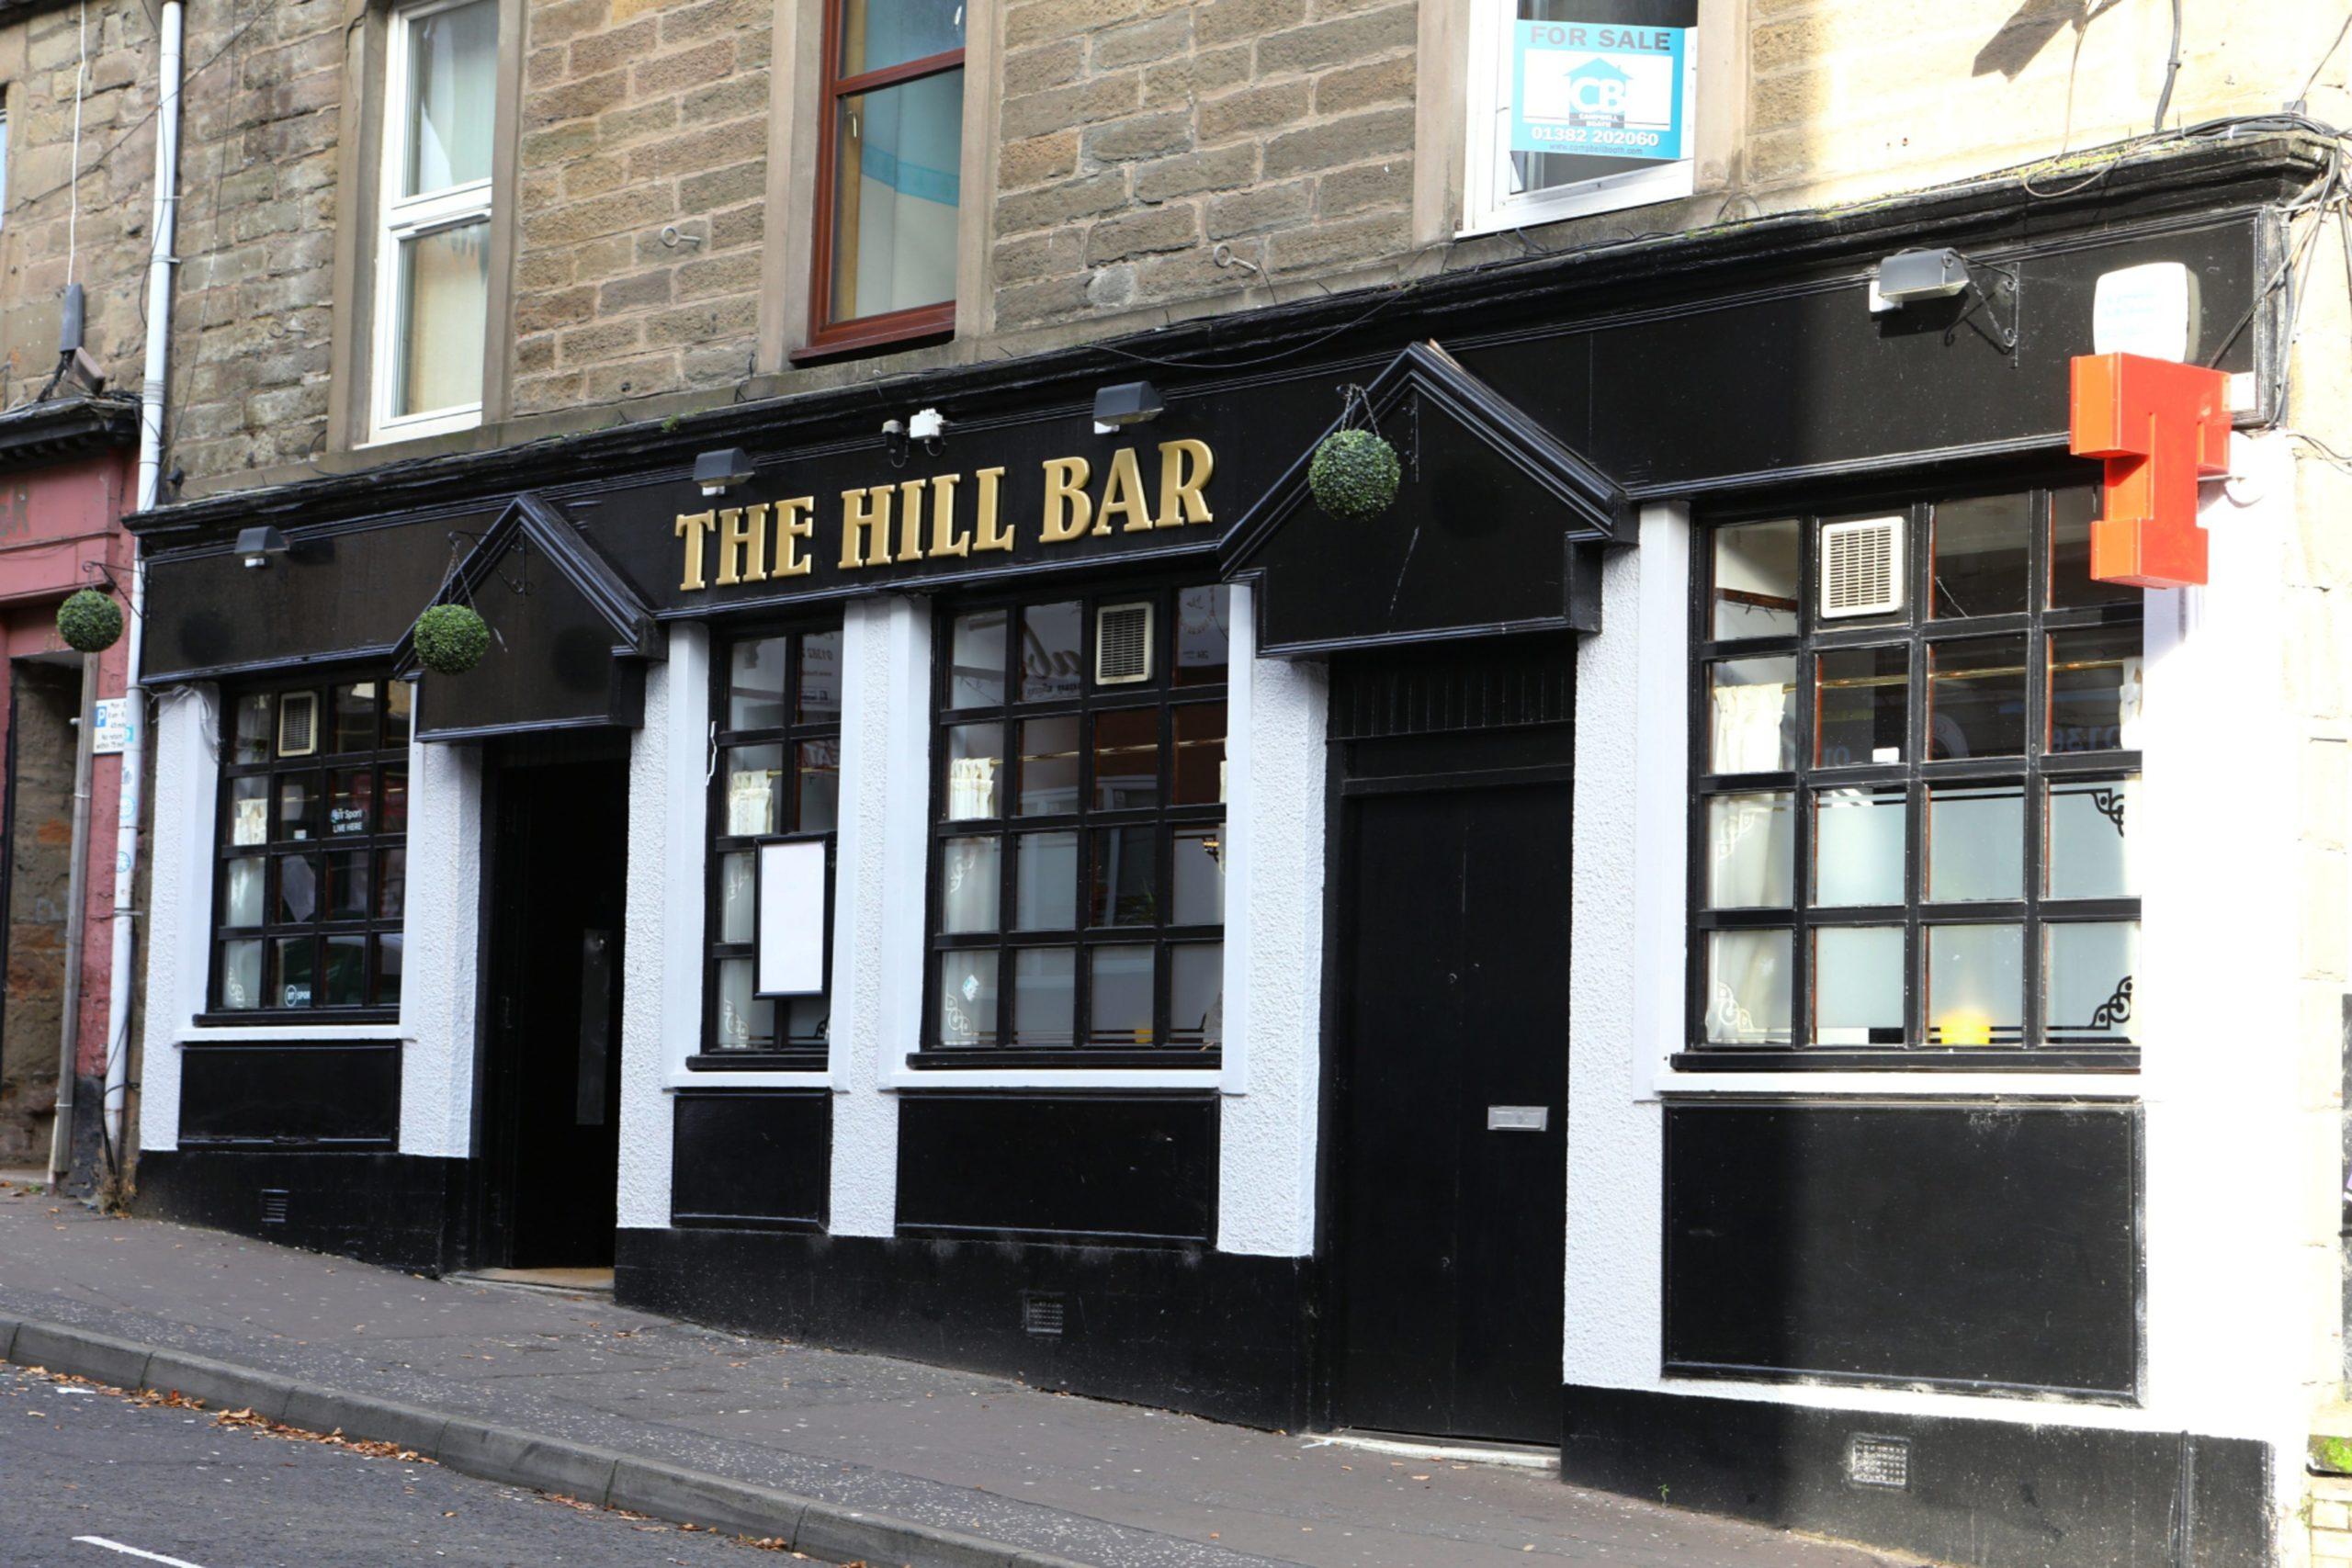 The Hill Bar